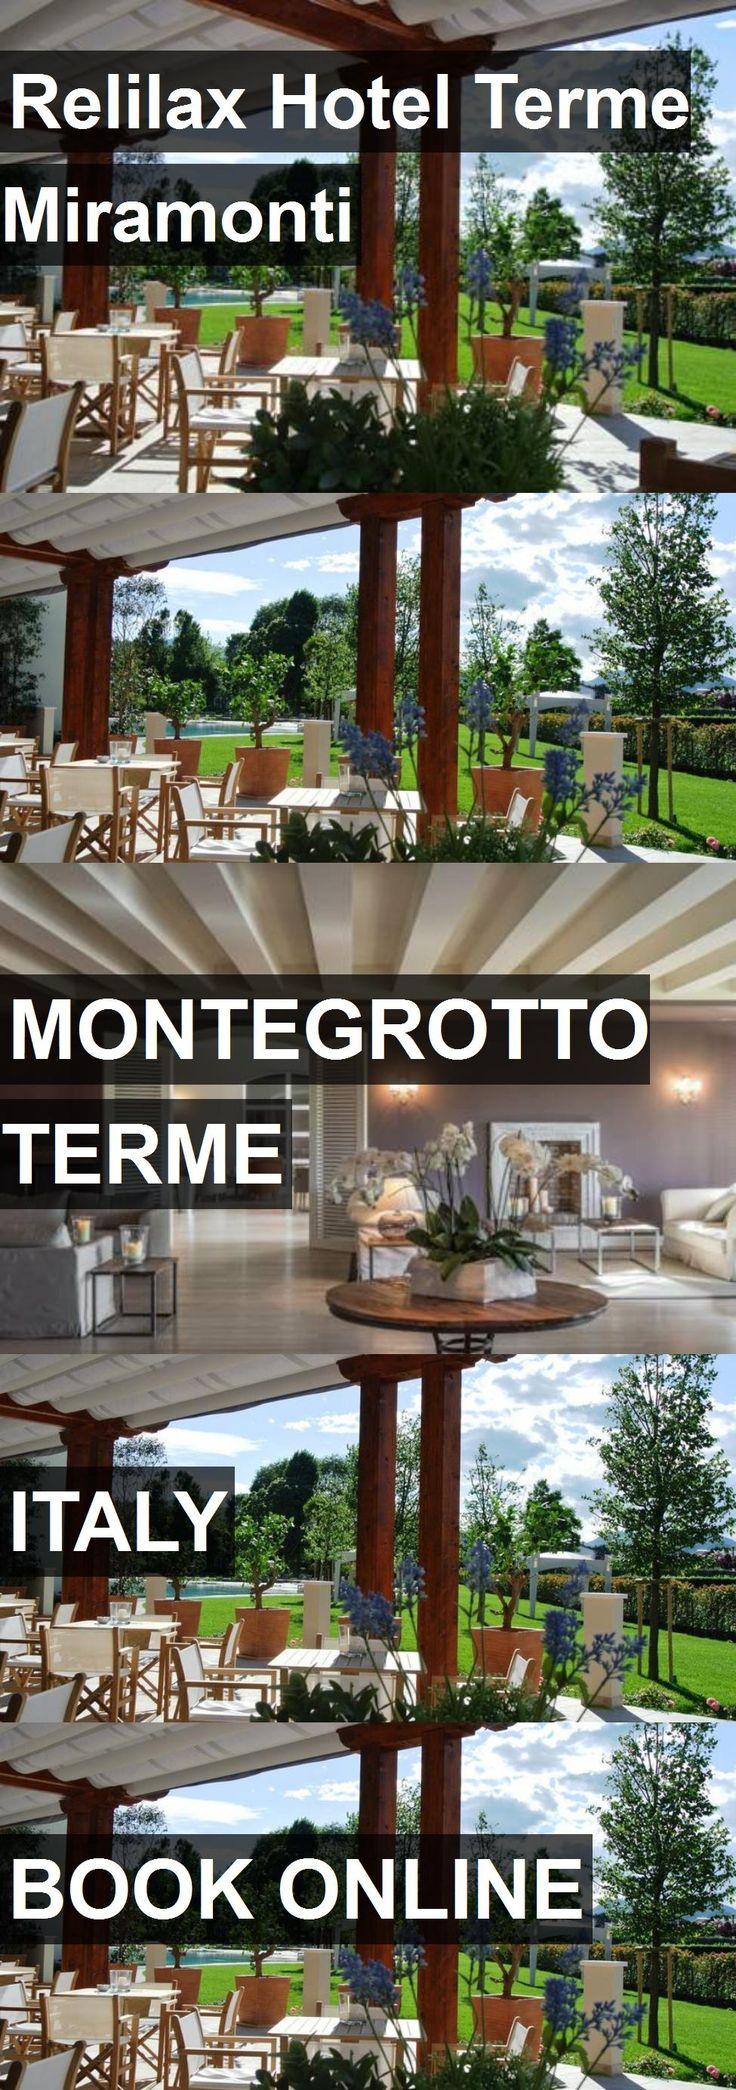 Relilax Hotel Terme Miramonti in Montegrotto Terme, Italy